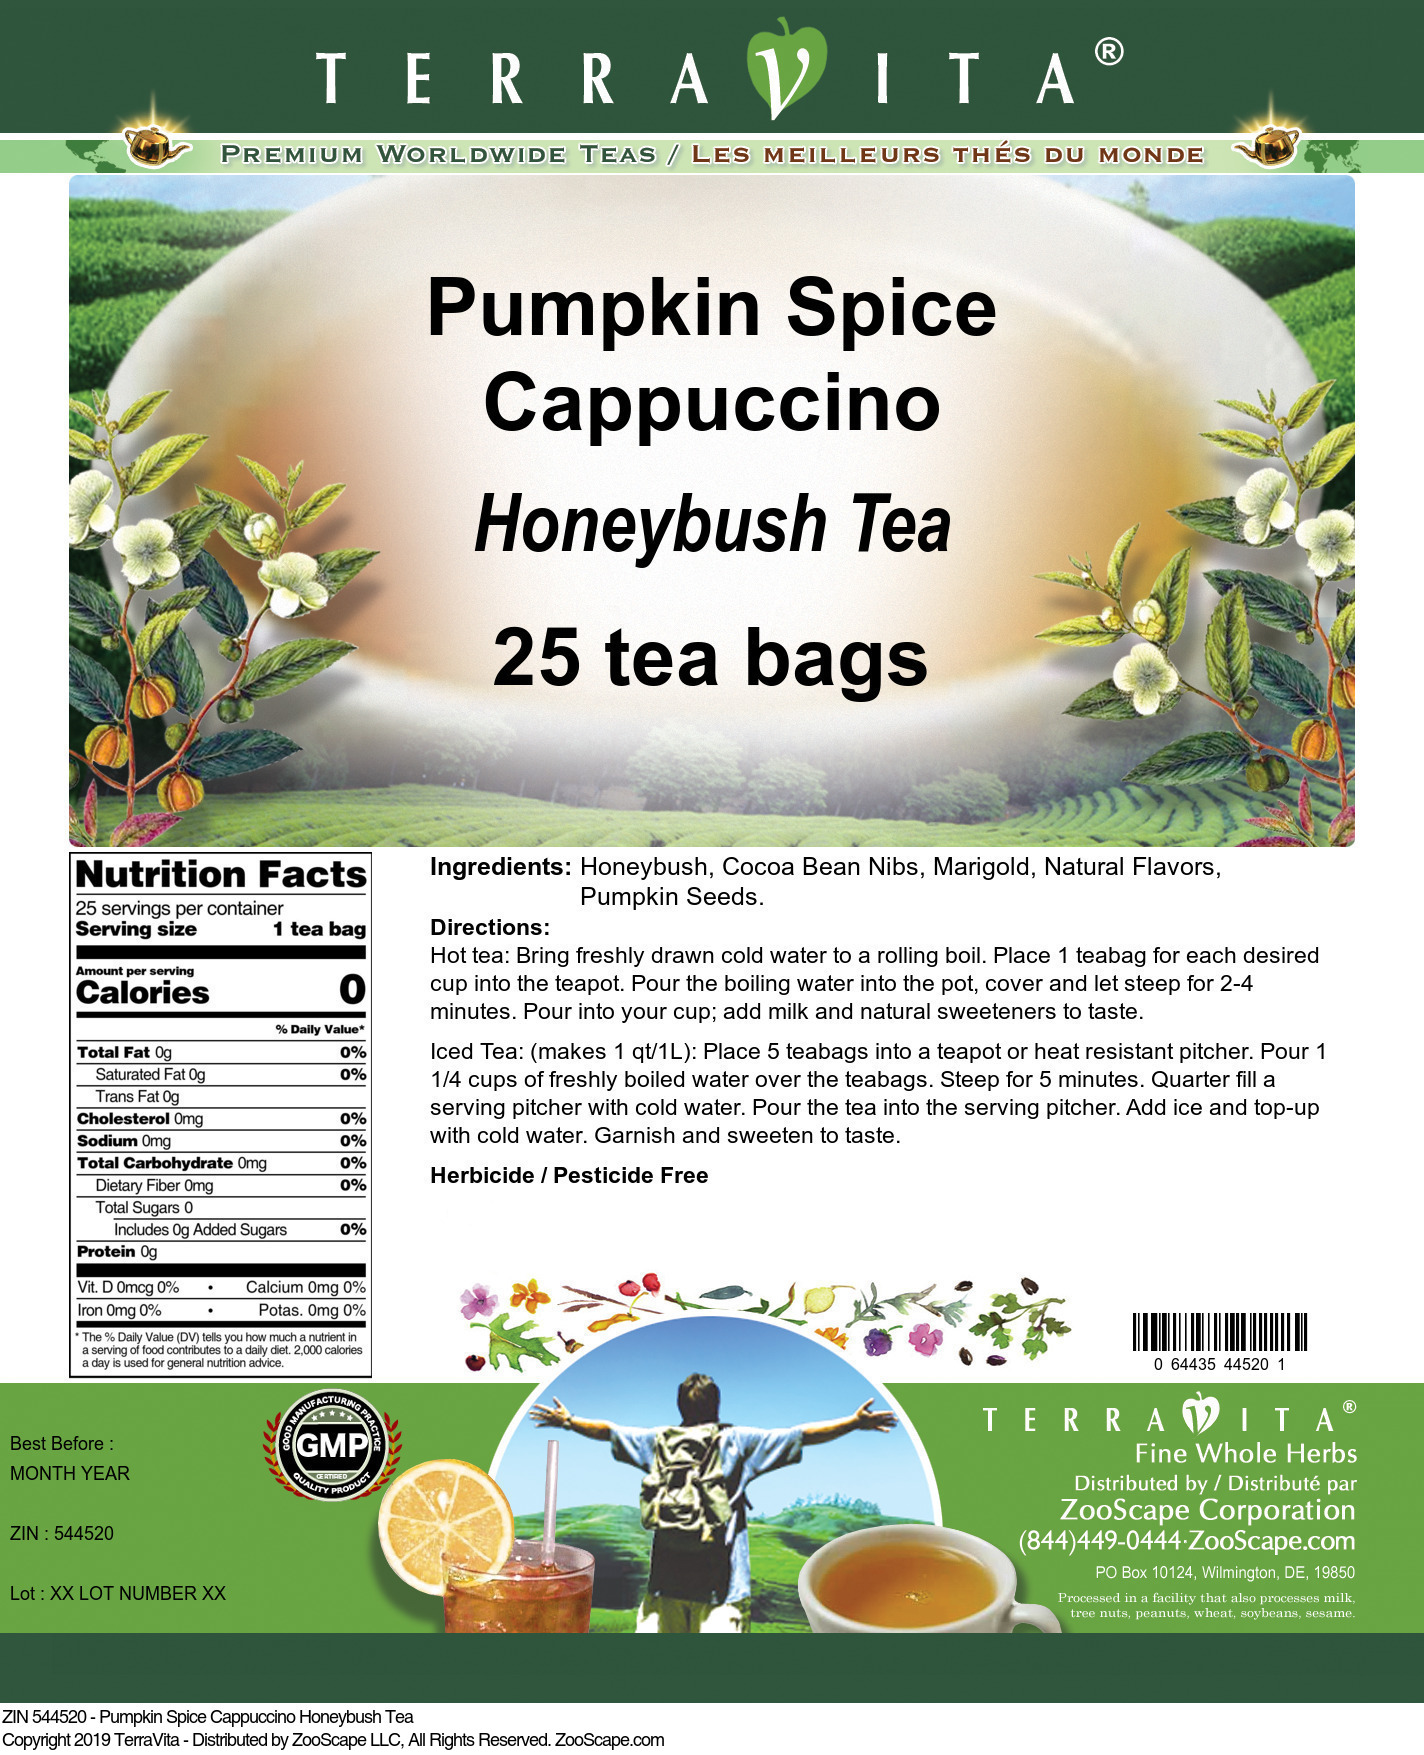 Pumpkin Spice Cappuccino Honeybush Tea